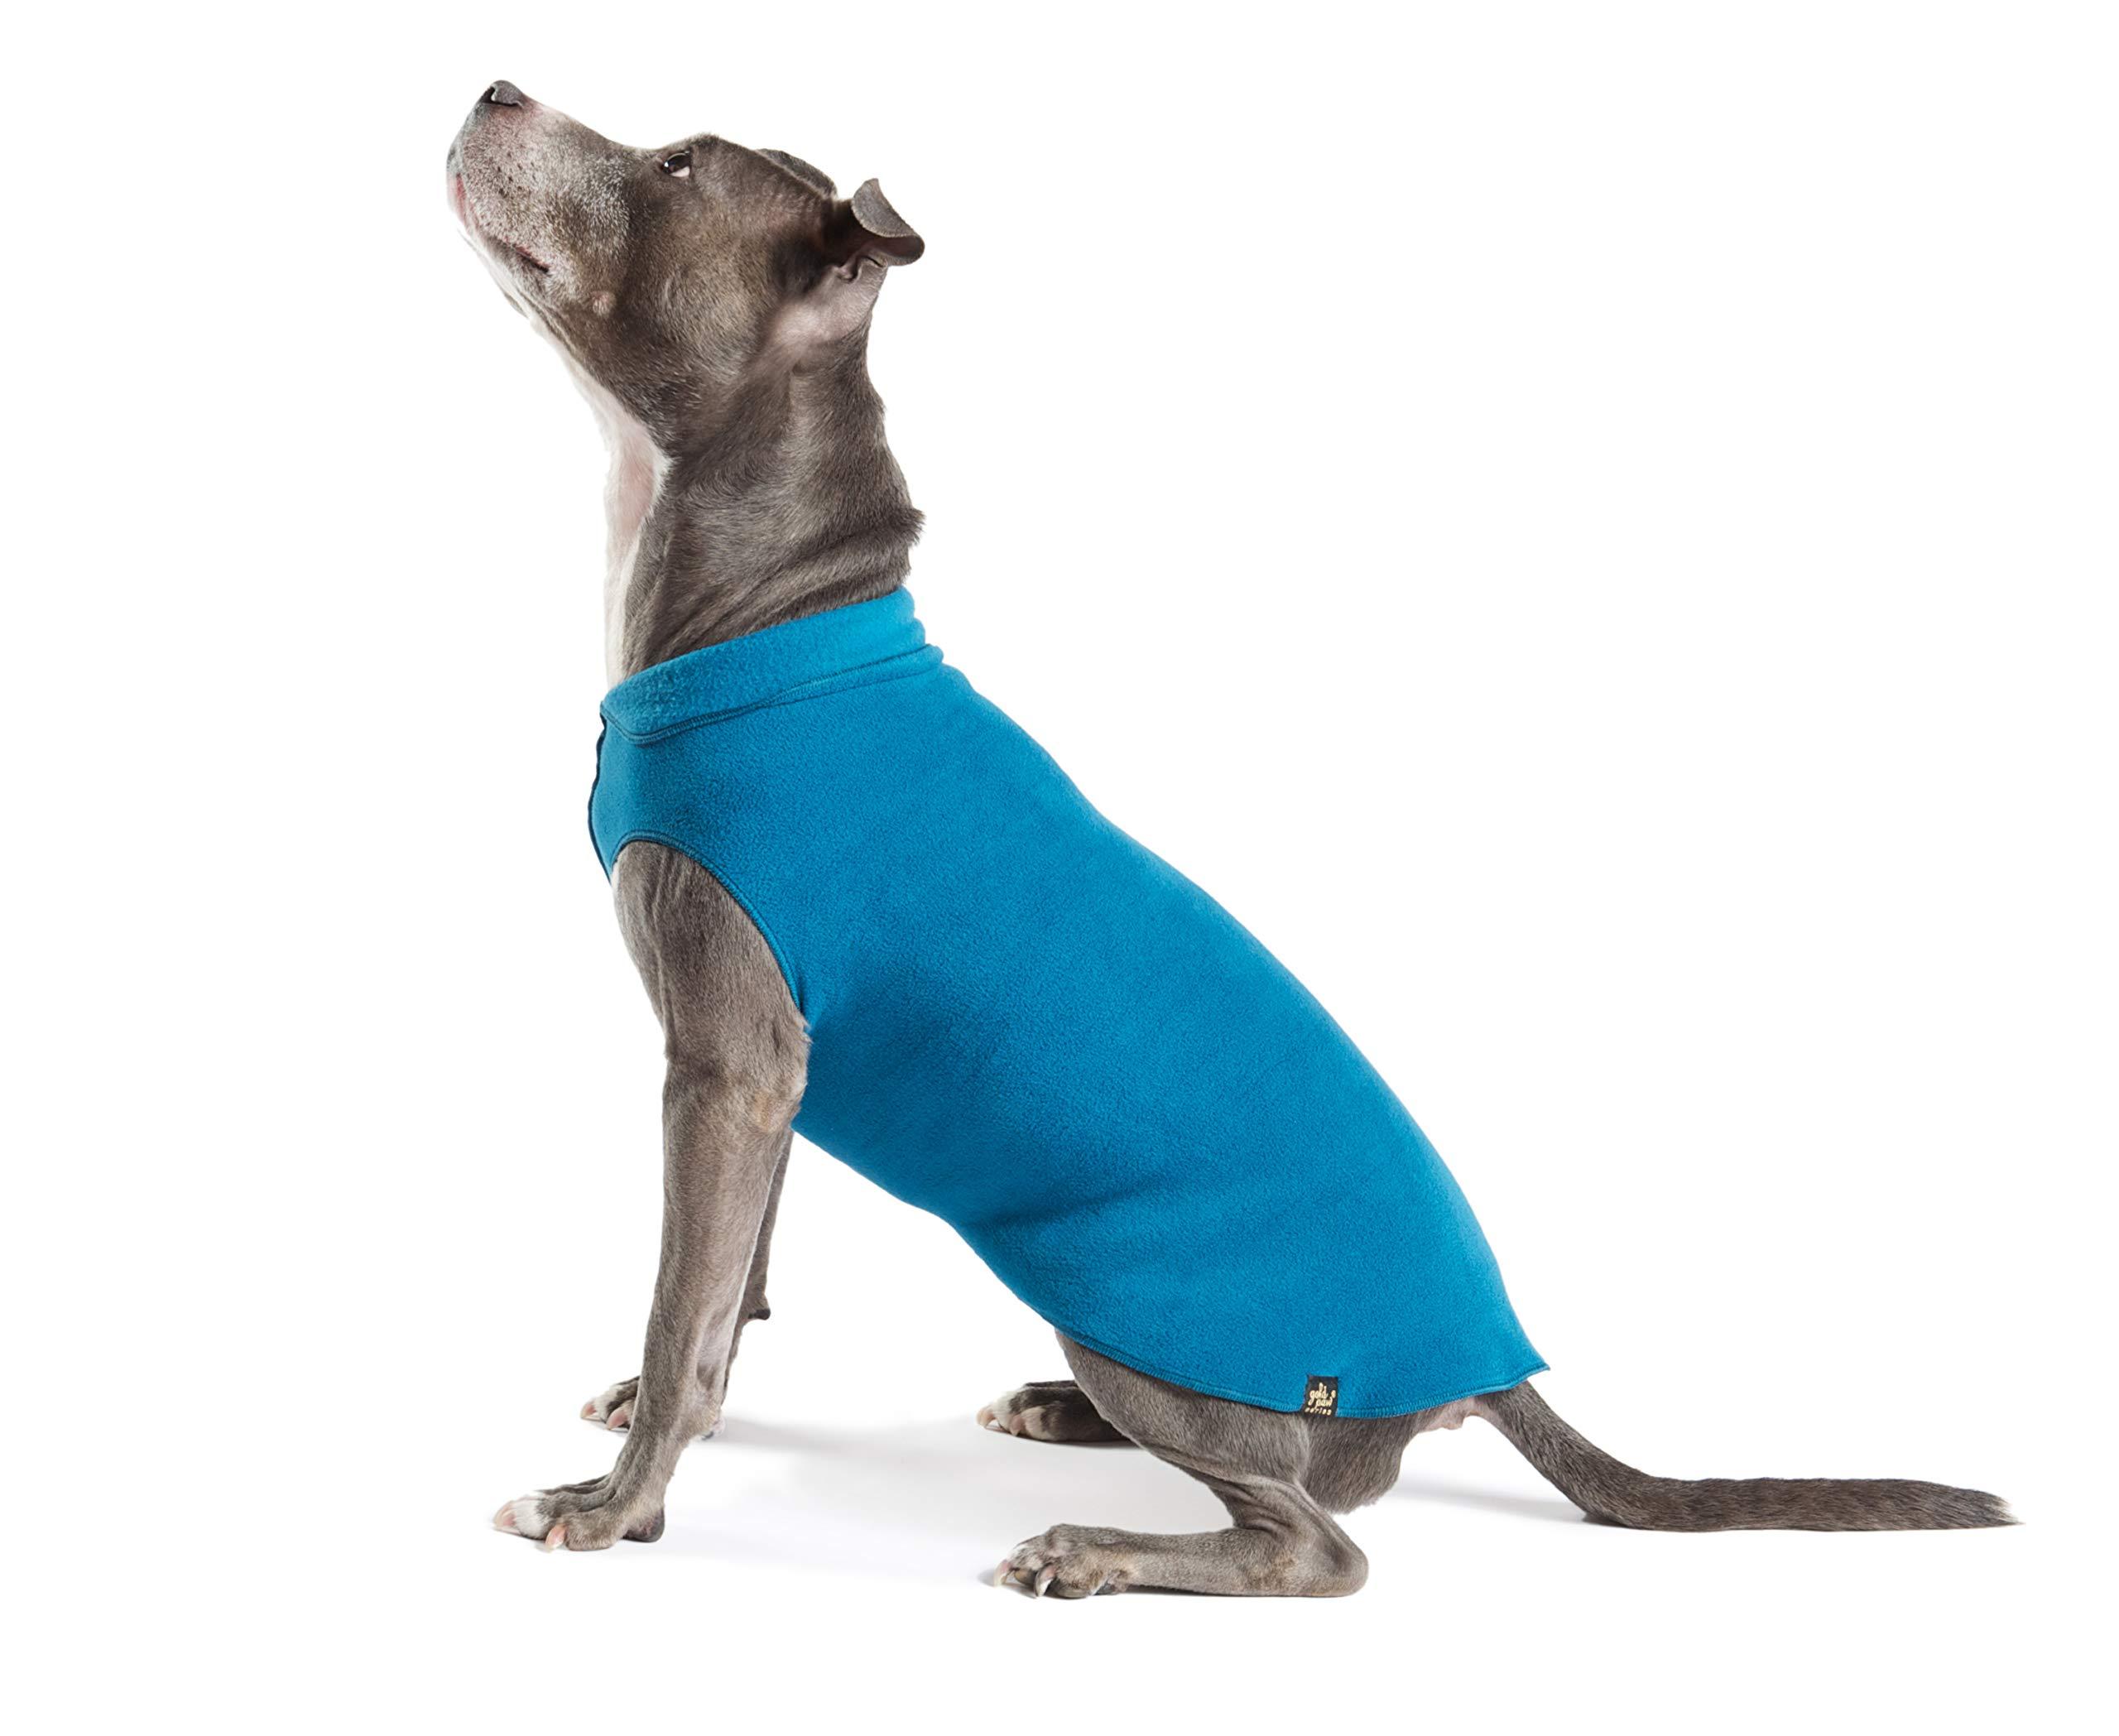 Gold Paw Stretch Fleece Dog Coat - Soft, Warm Dog Clothes, Stretchy Pet Sweater - Machine Washable, Eco Friendly - All Season, Marine Blue, Size 18